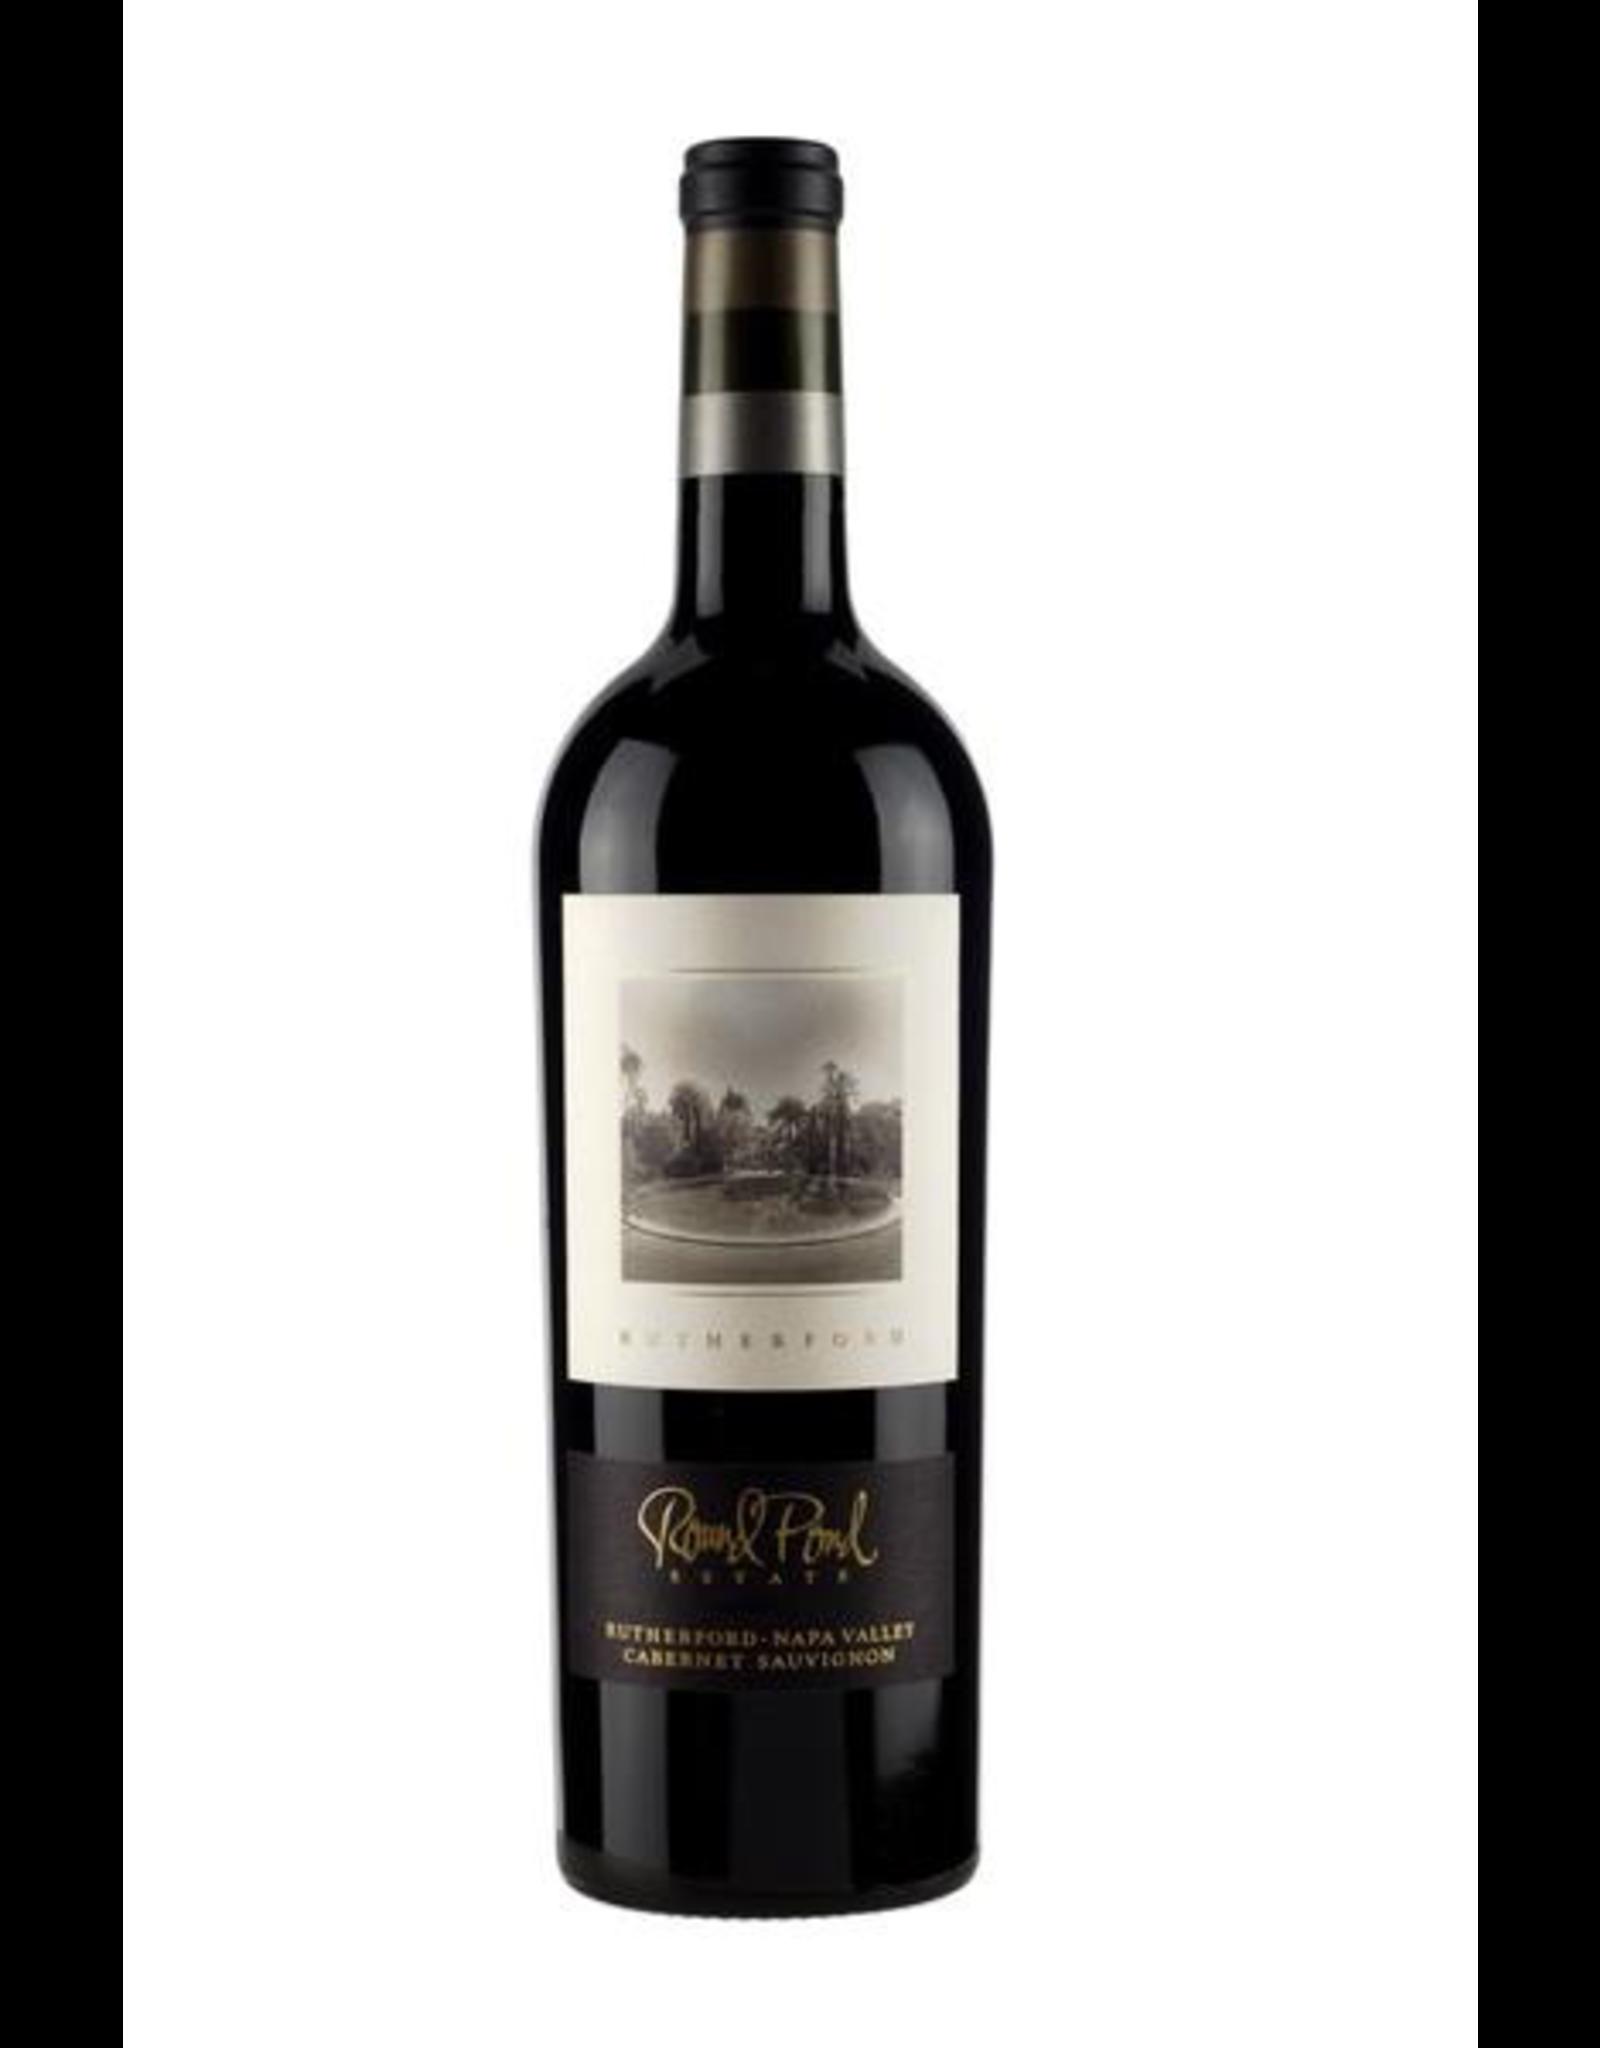 Red Wine 2016, Round Pond Estate Vineyard Rutherford, Cabernet Sauvignon, Rutherford, Napa Valley, California,15% Alc, CTnr, JS92